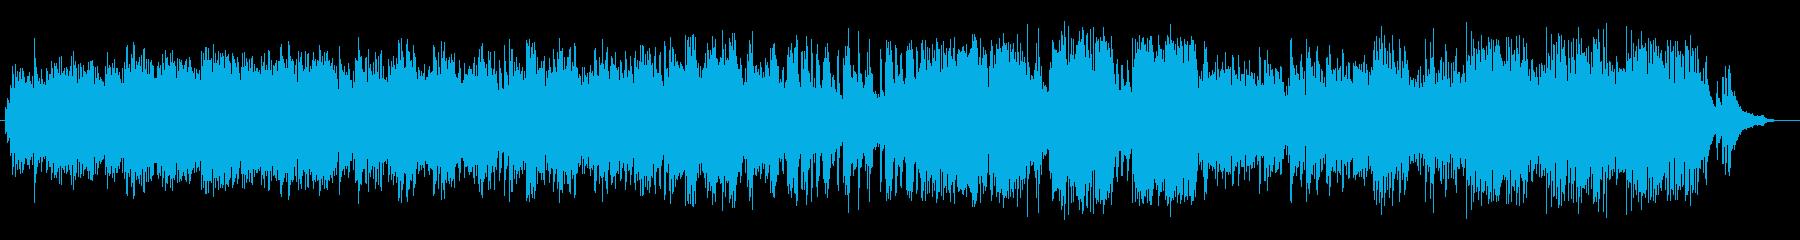 A dark and dark piano song's reproduced waveform